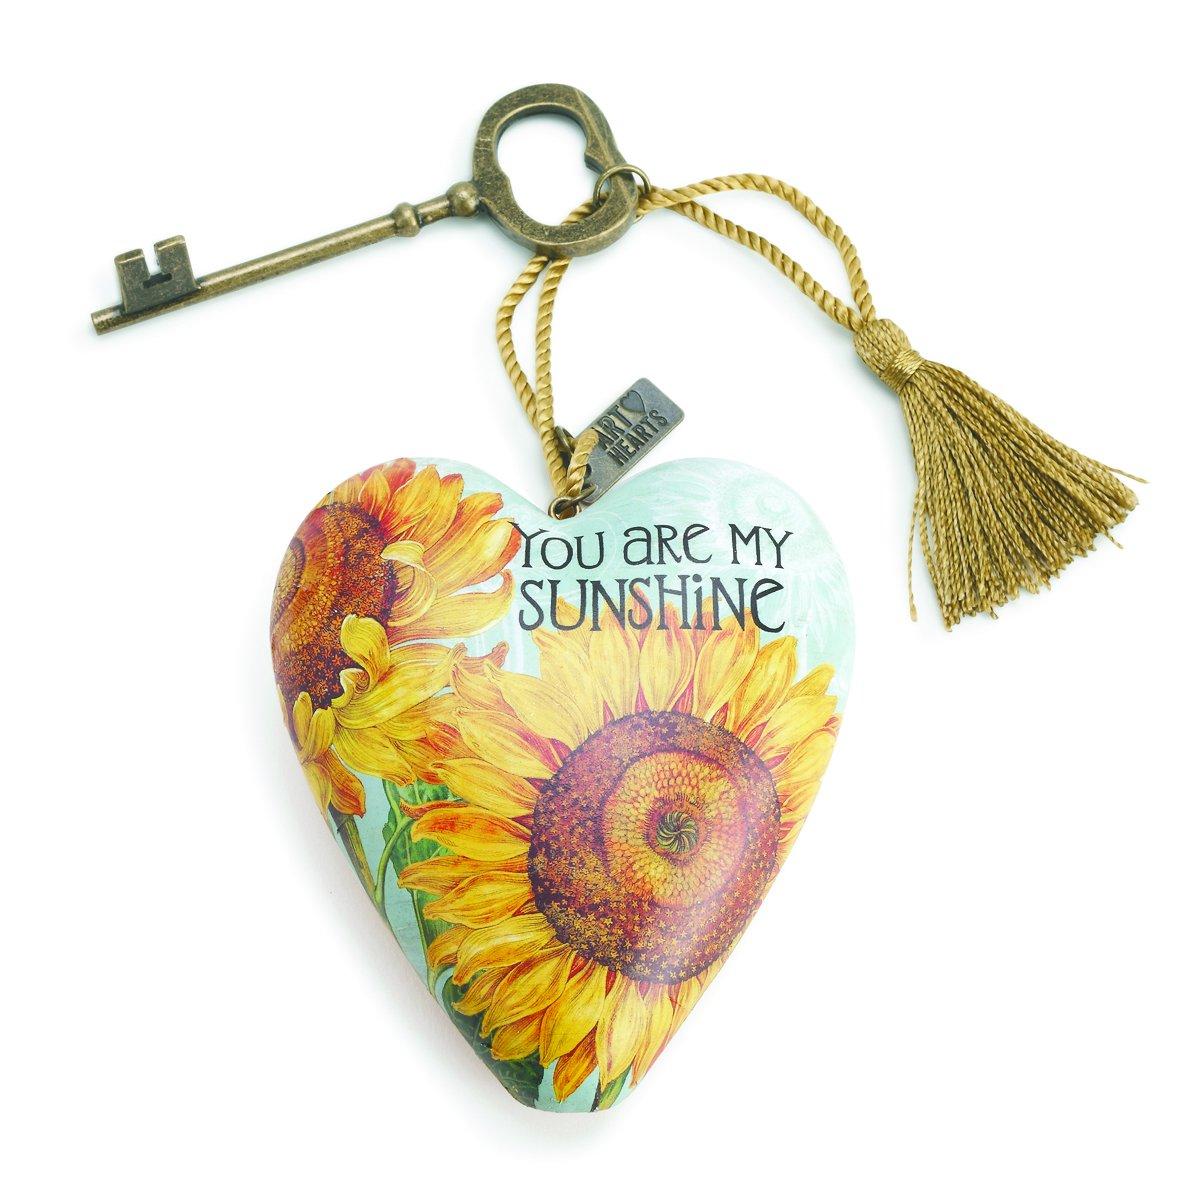 DEMDACO You Are My Sunshine Sunflower Yellow 4 x 3 Inch Heart Shaped Resin Keepsake Decoration